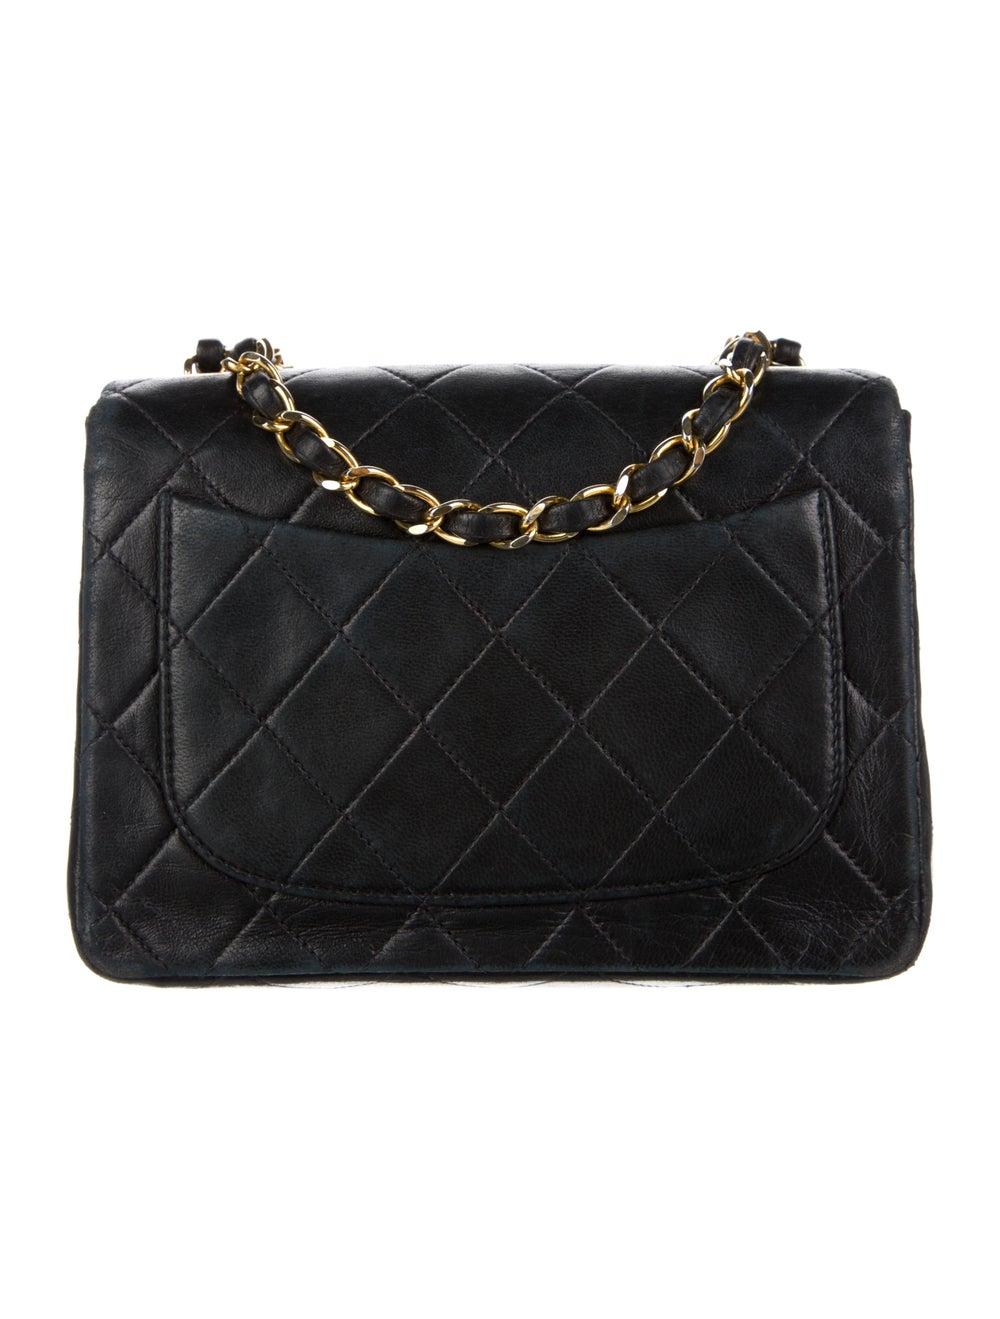 Chanel Vintage Mini Square Flap Bag Blue - image 4